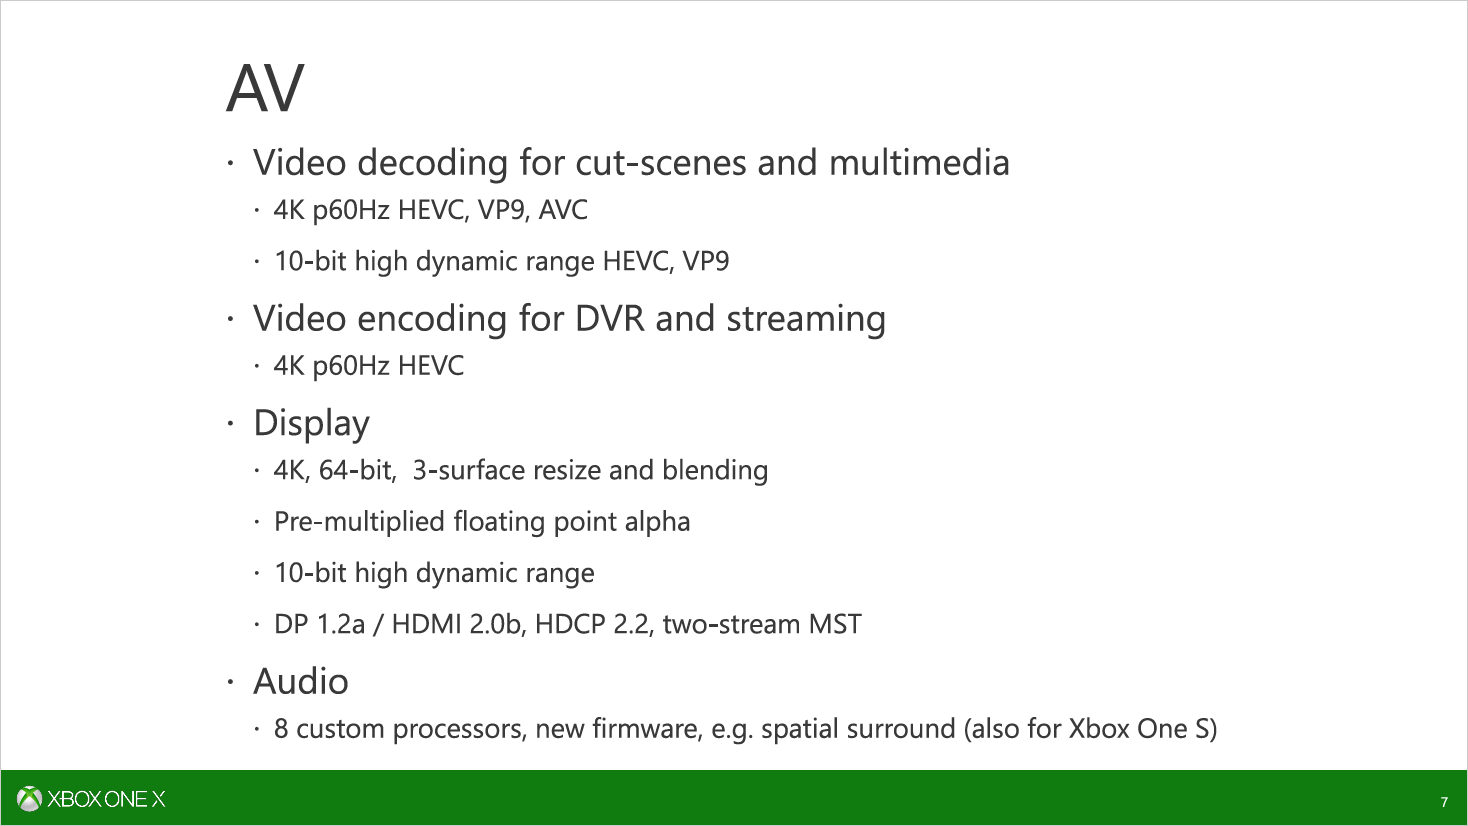 Scorpio Engine: Microsoft erläutert SoC der Xbox One X -